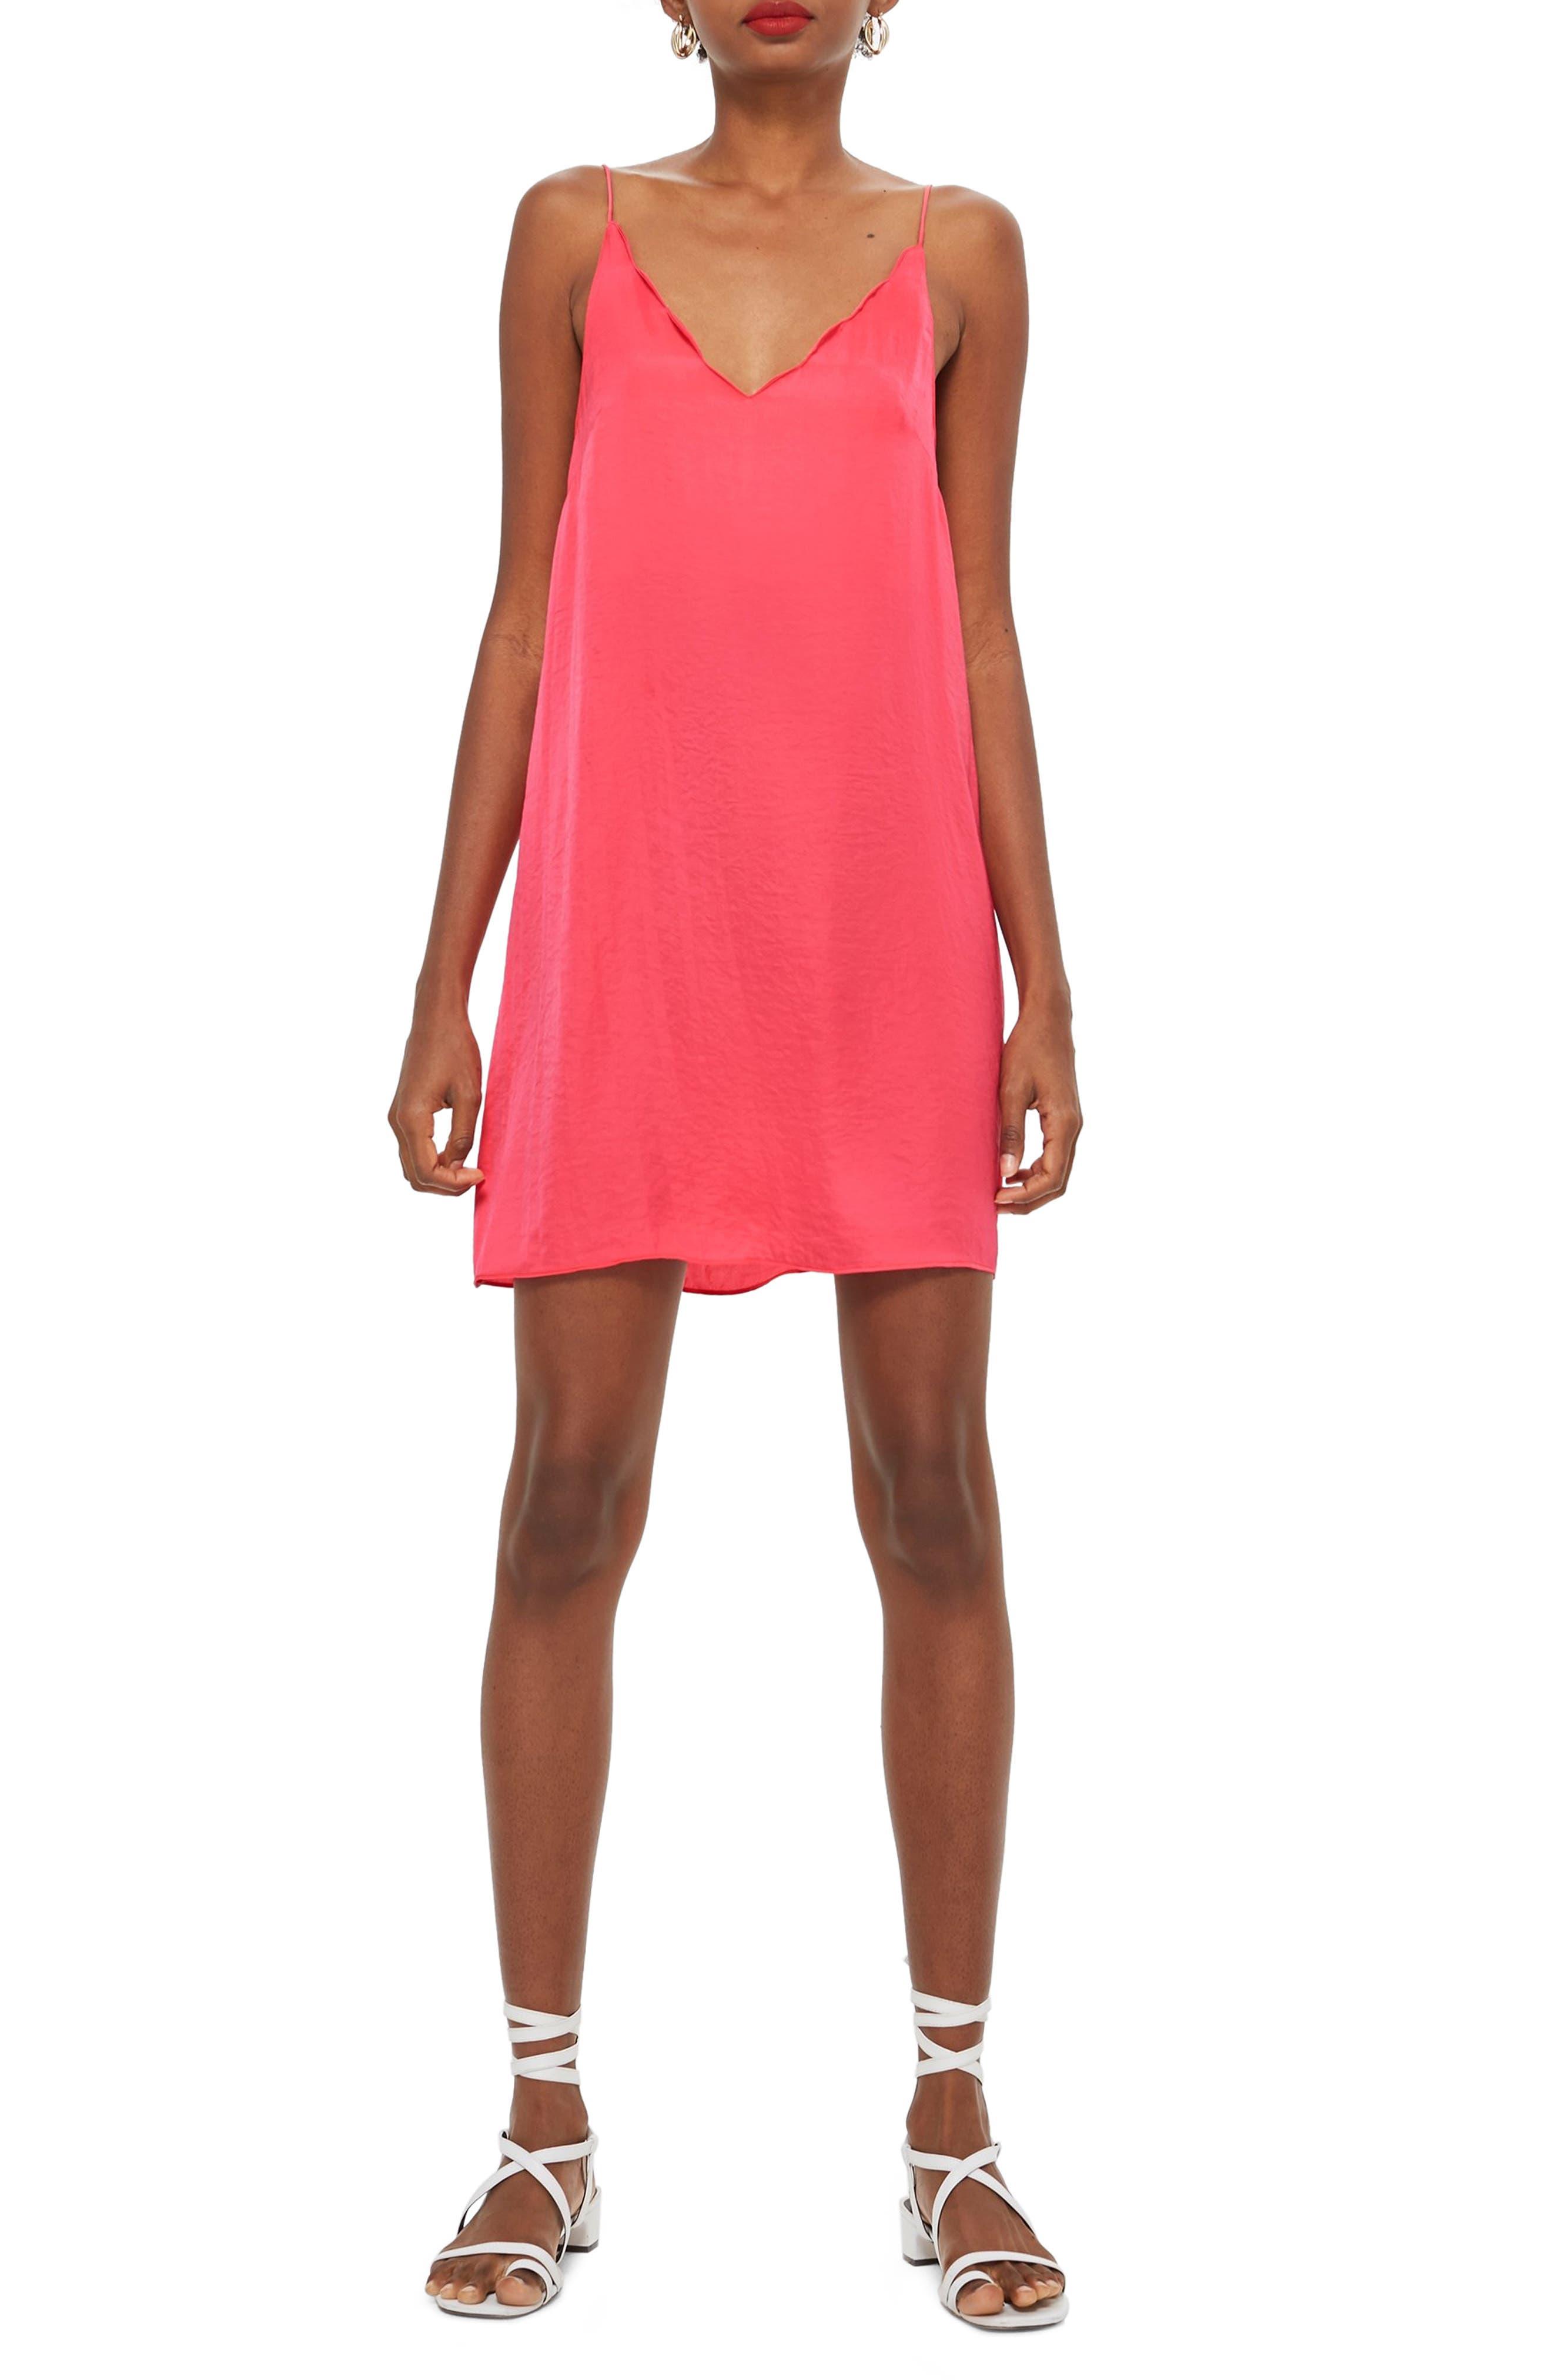 Topshop Scallop Mini Slipdress, US (fits like 0-2) - Pink